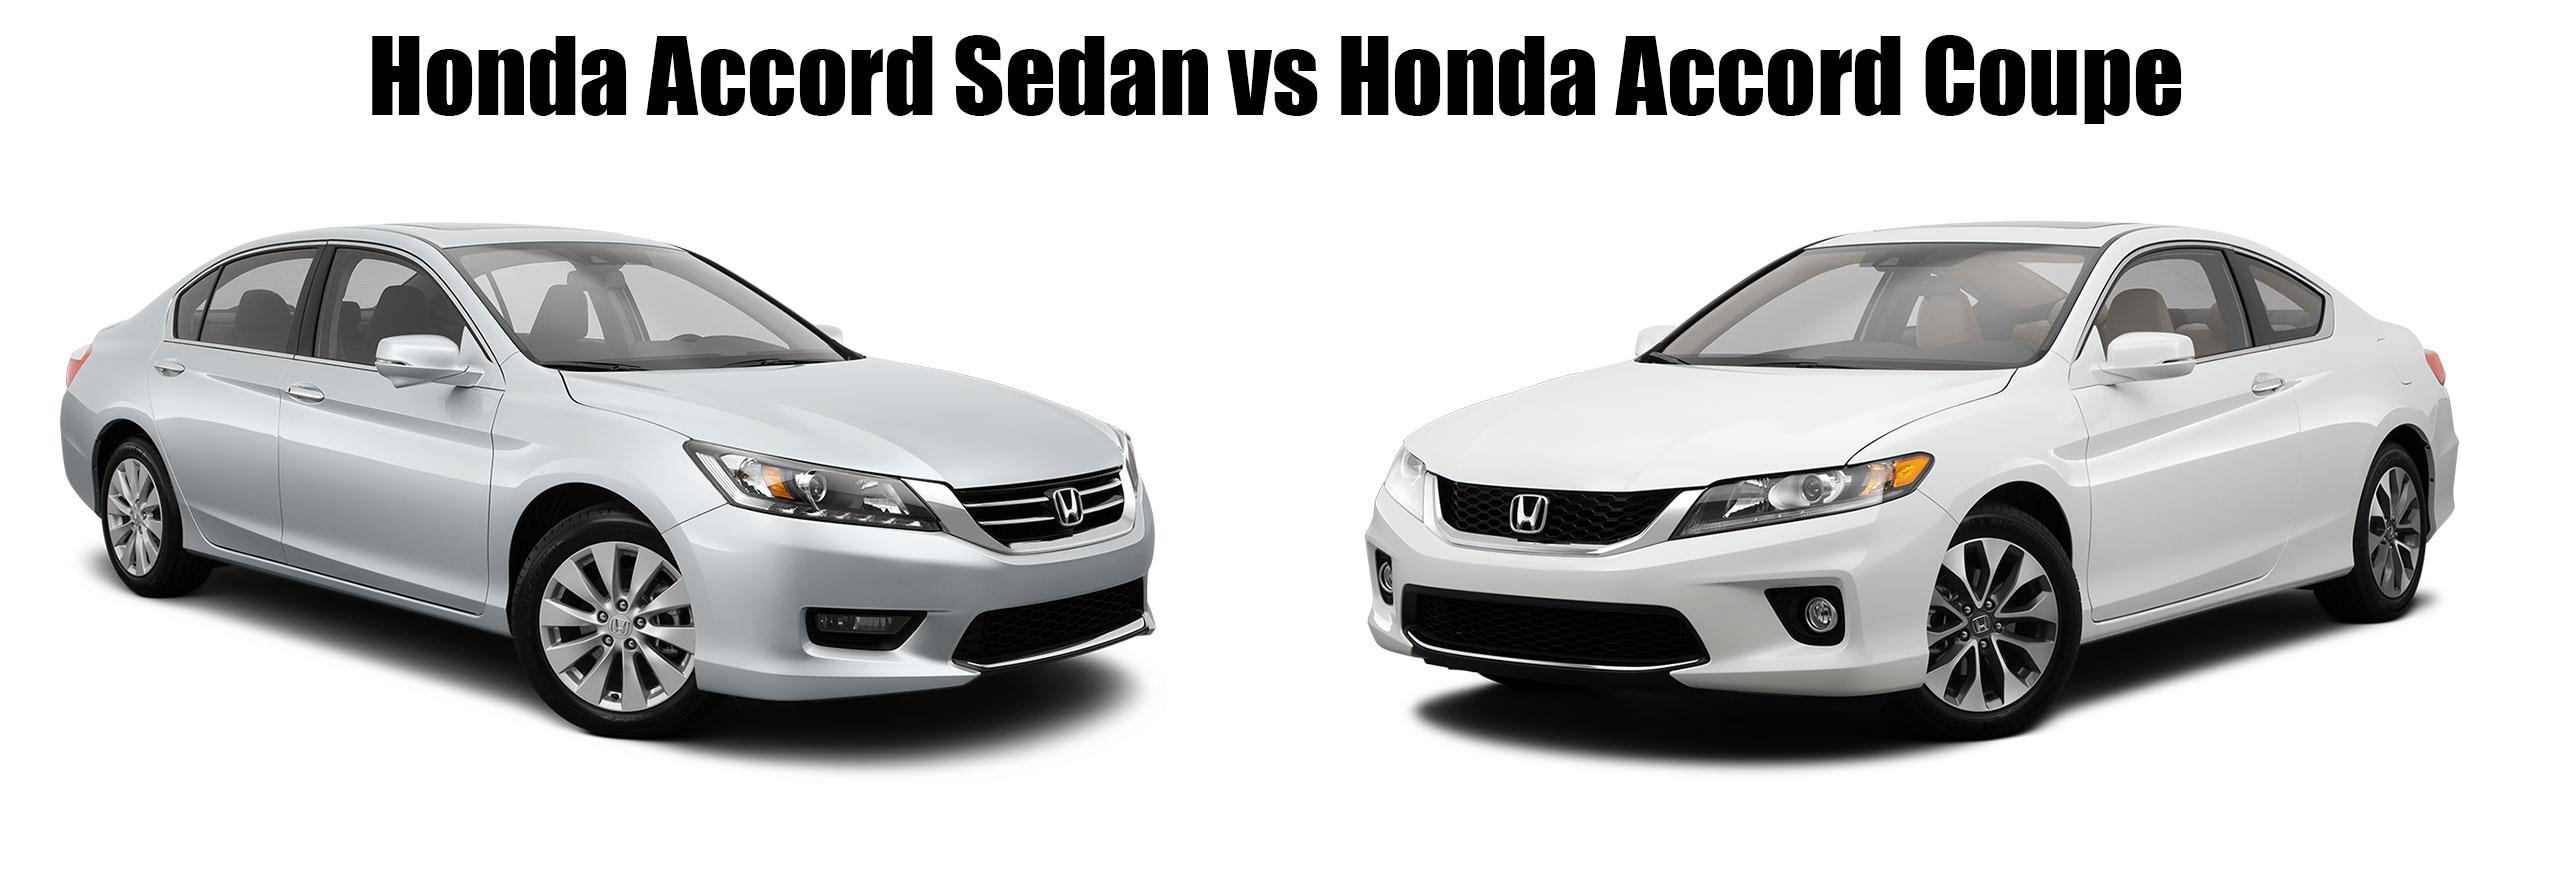 Honda Accord Coupe Vs Sedan Comparison Hendrick Honda